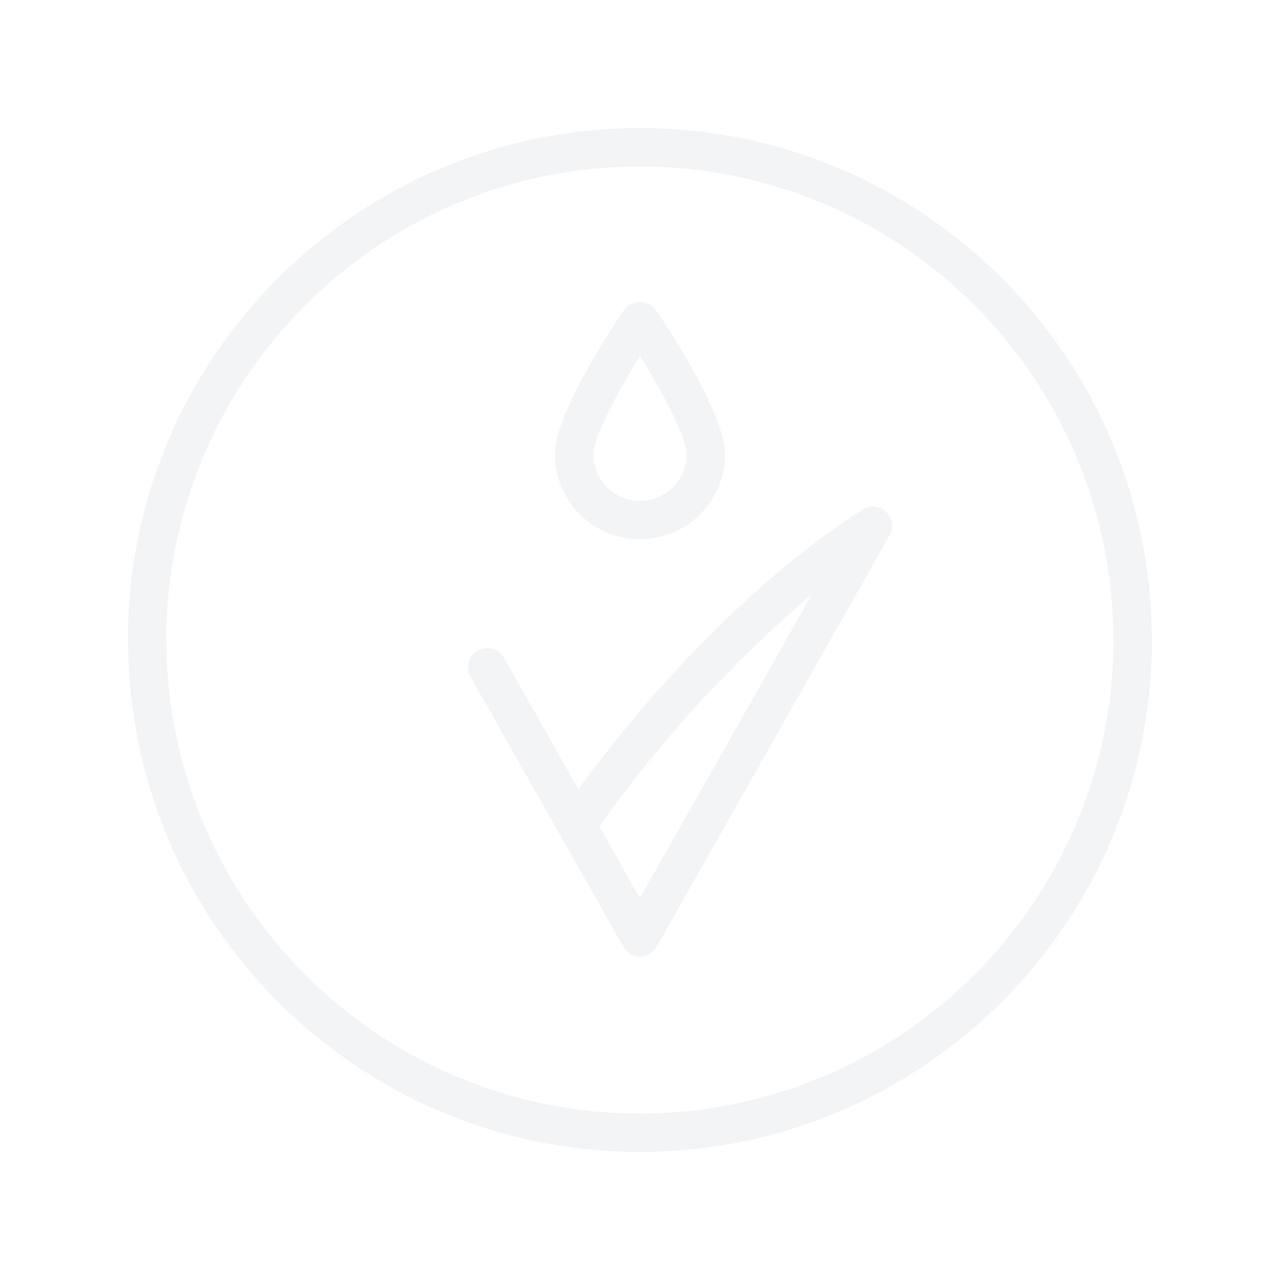 BIODROGA Golden Caviar Sheet Mask 16ml увлажняющая маска